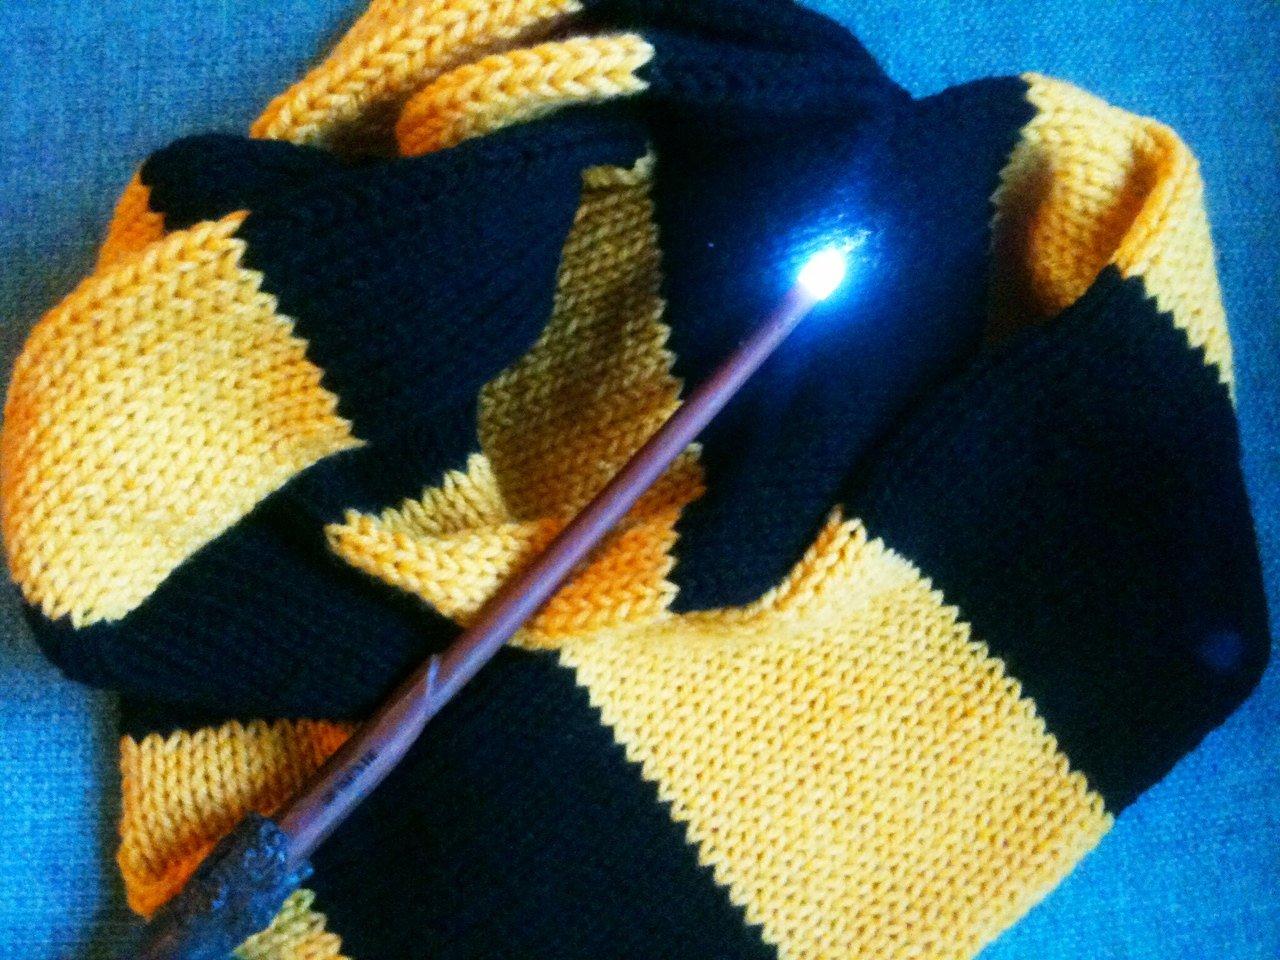 Amazon.com: Handmade Knit Hufflepuff Scarf Hogwarts: Handmade